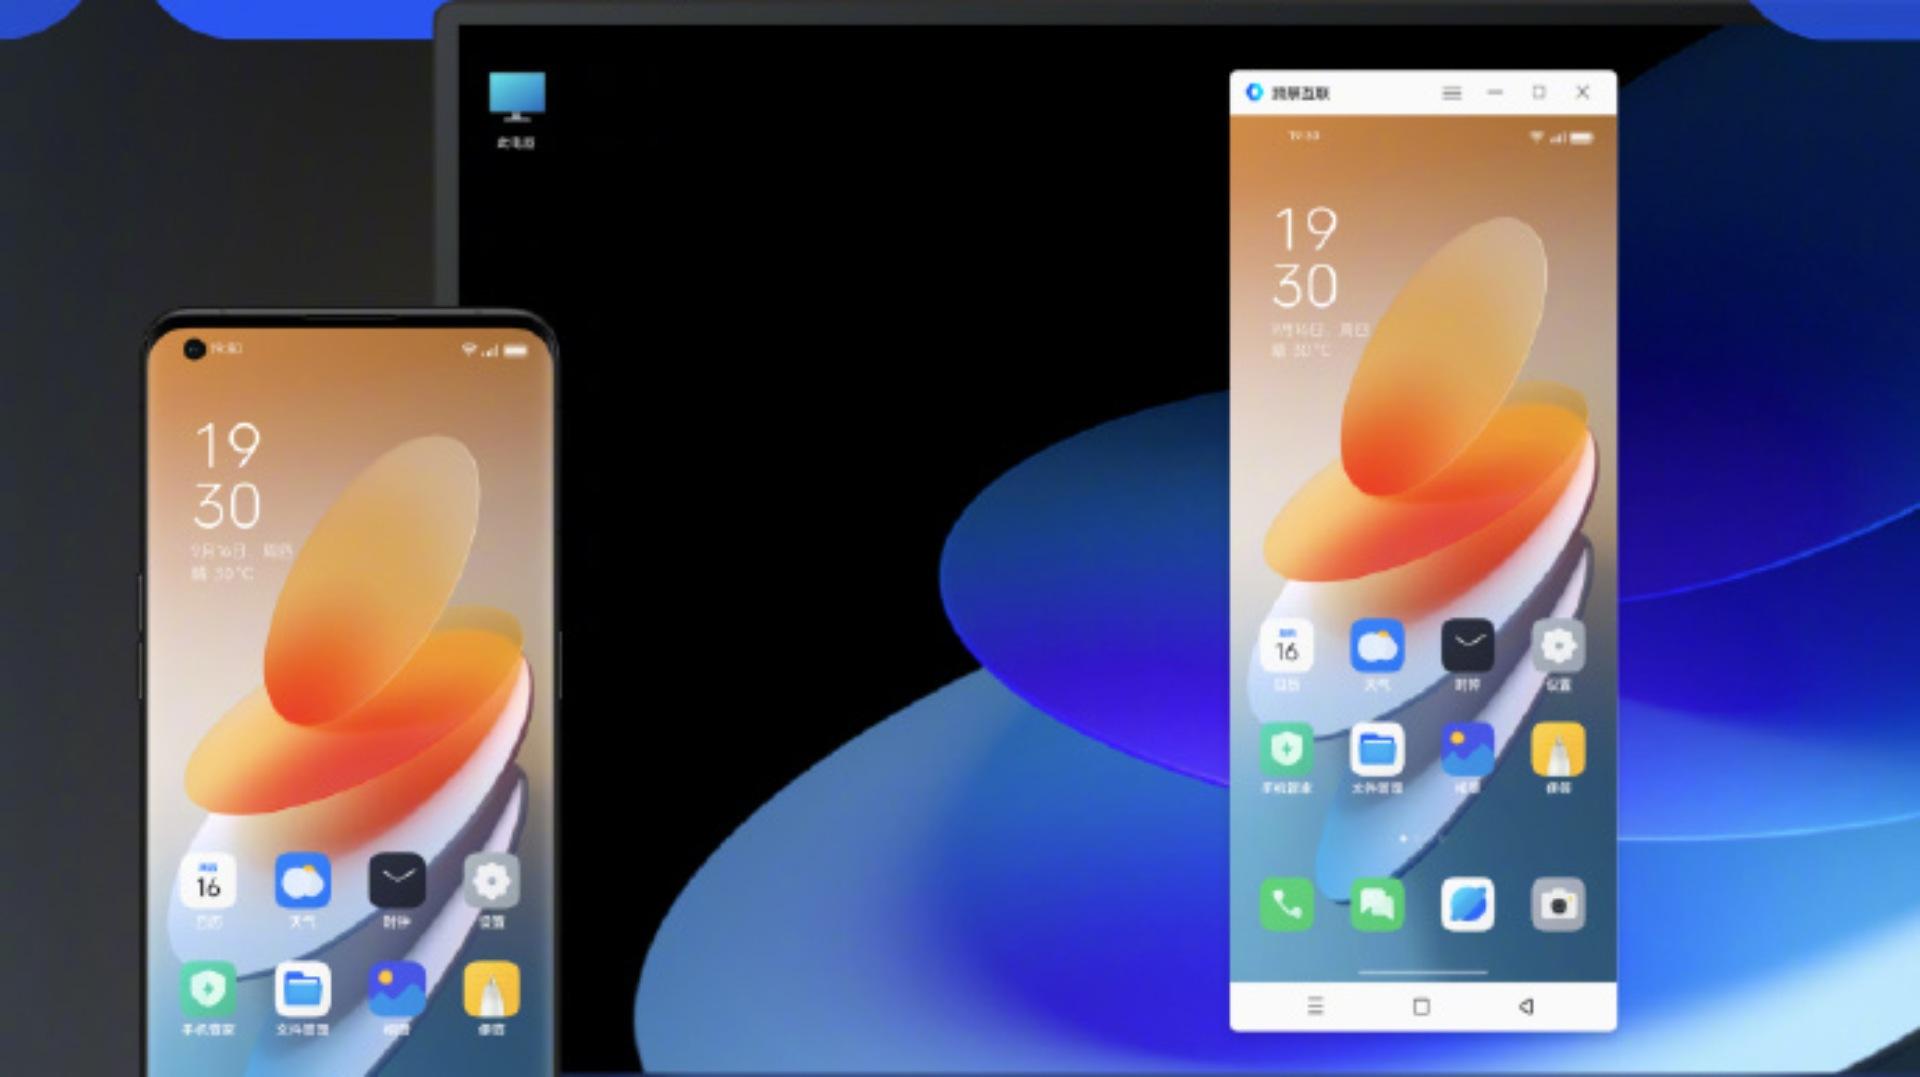 Color OS 12 cross-screen interconnection